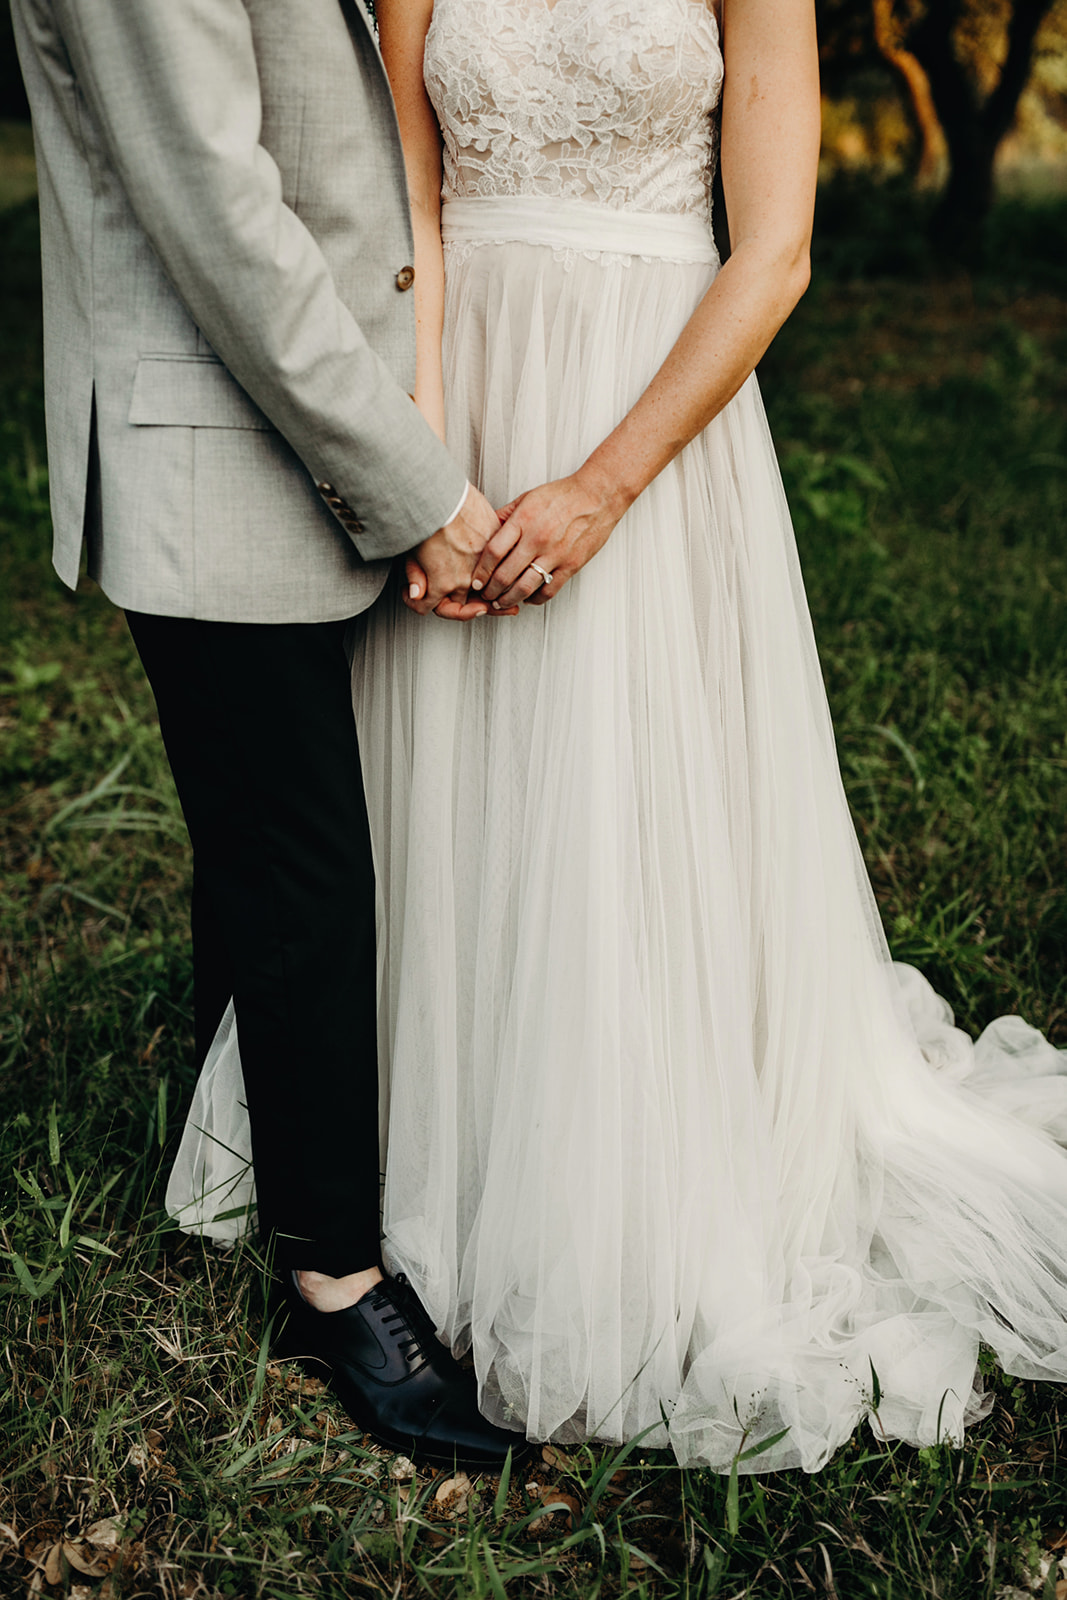 austin-wedding-lindsey-bryce-538.jpg